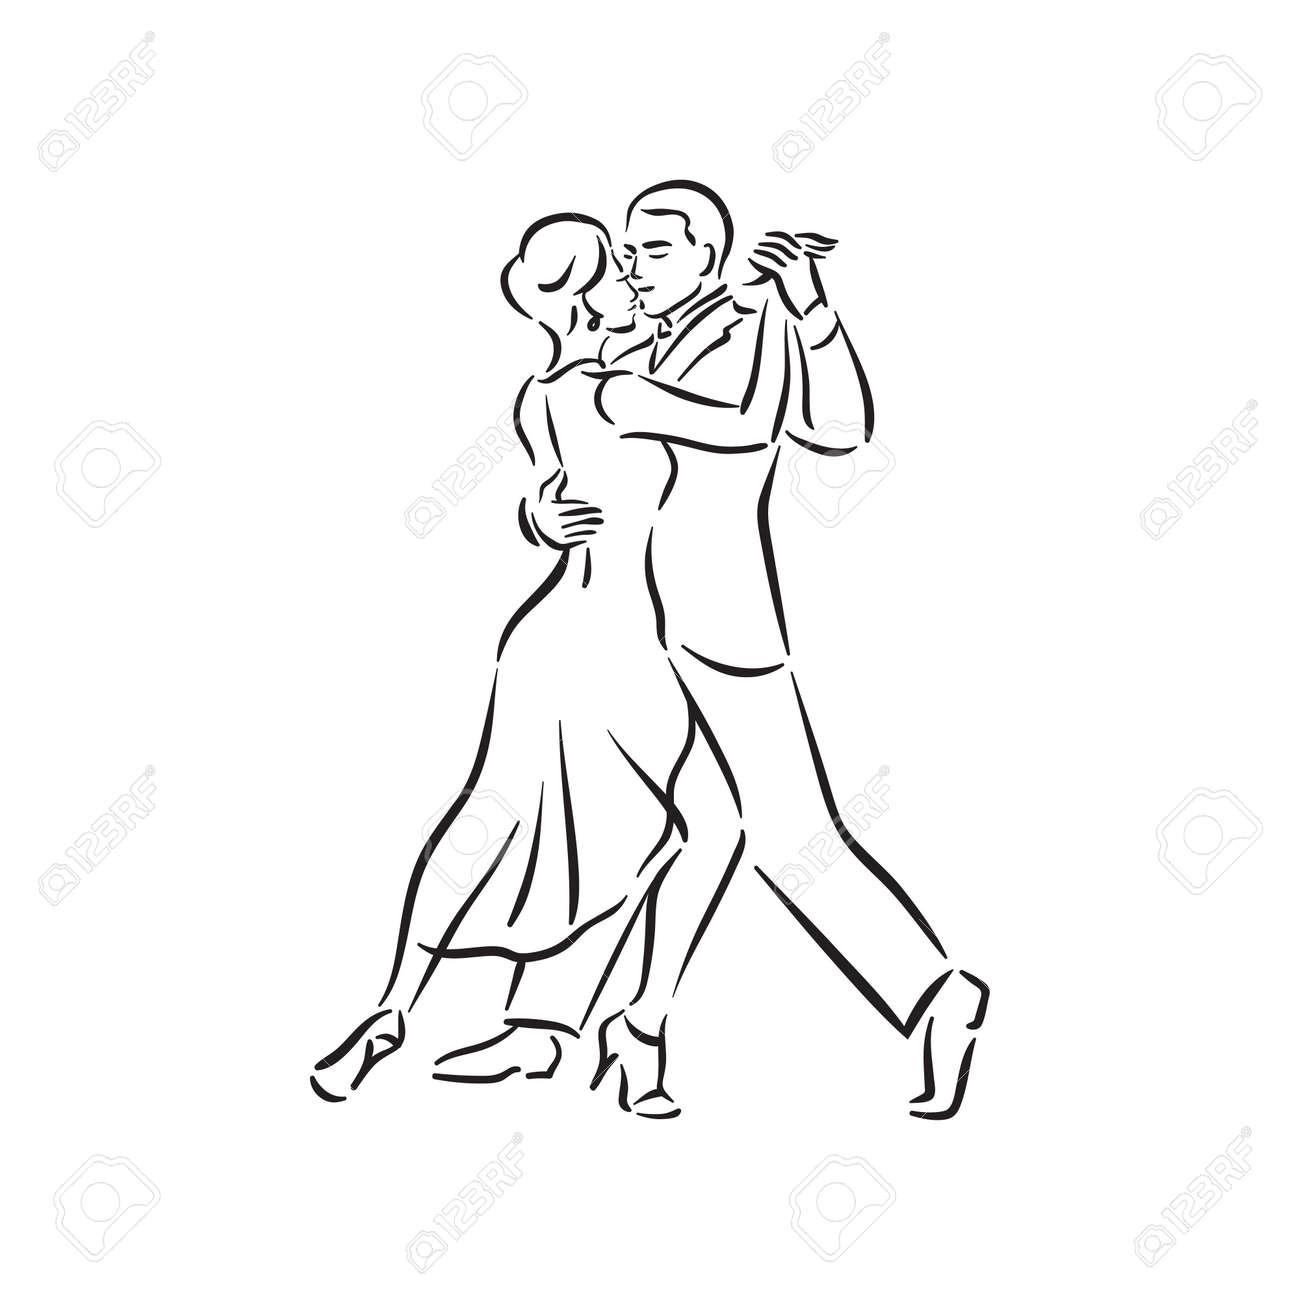 Argentine tango and salsa romance couple social pair dance illustration - 158190480